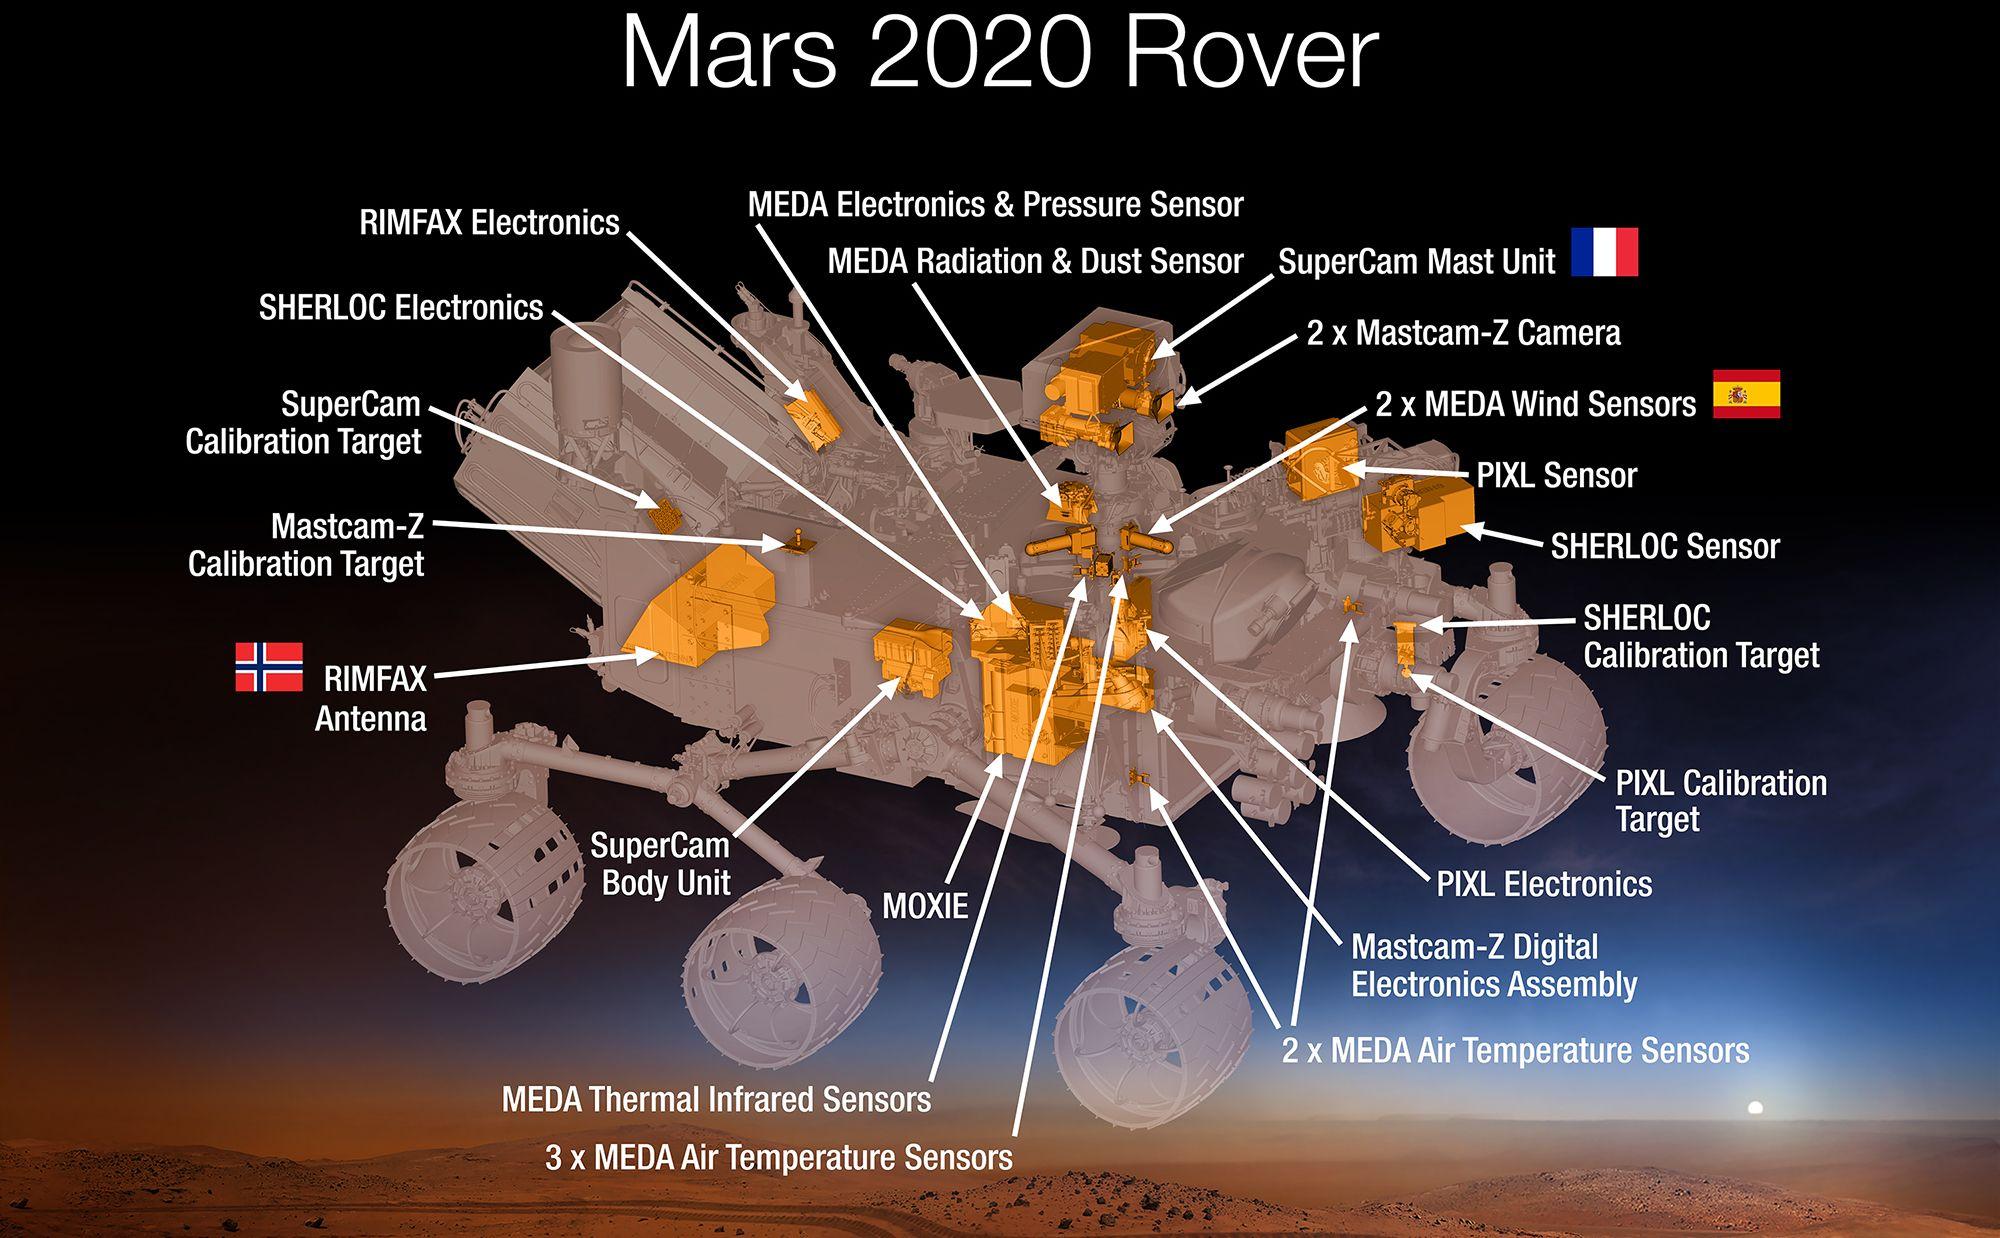 Norge bidrar på Mars 2020-roveren.